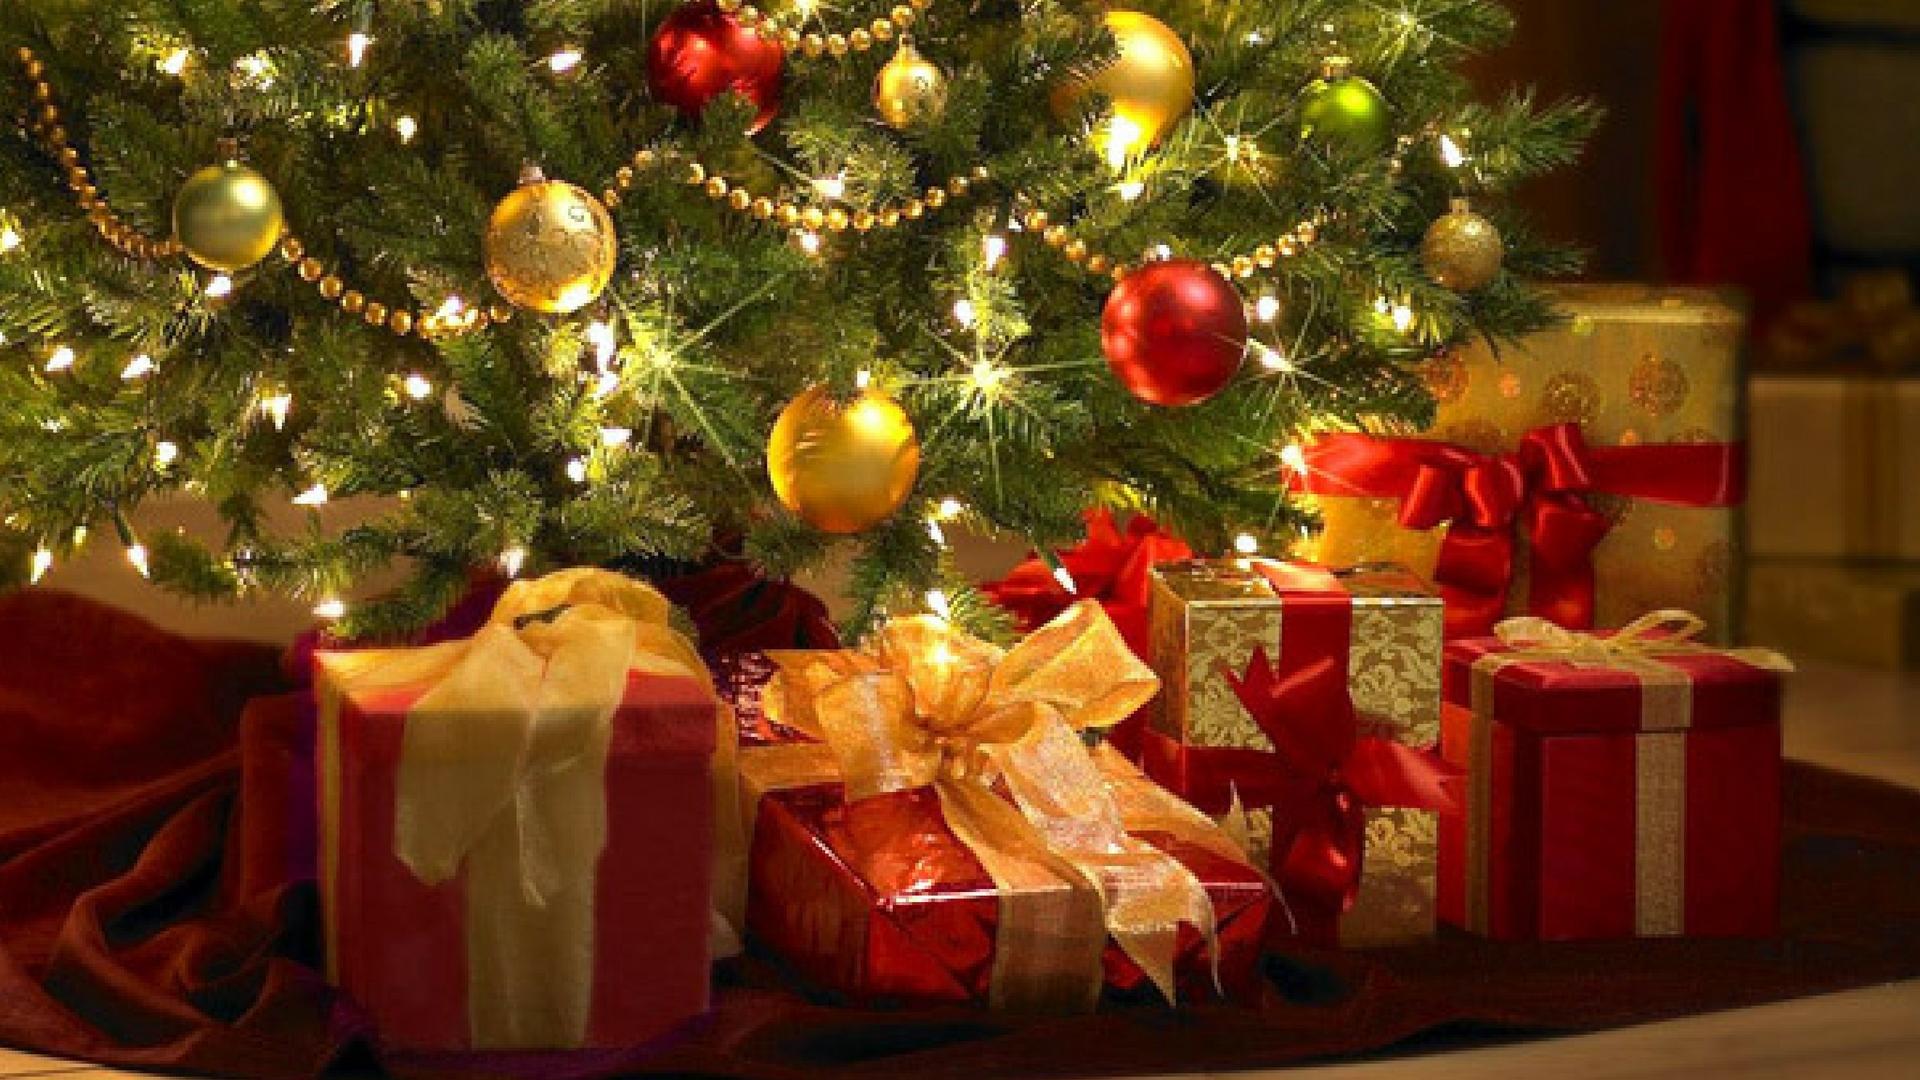 Idee Cadeau Noel Jeune.Noel 2016 12 Cadeaux Labellises Jeunes Cathos Jeunes